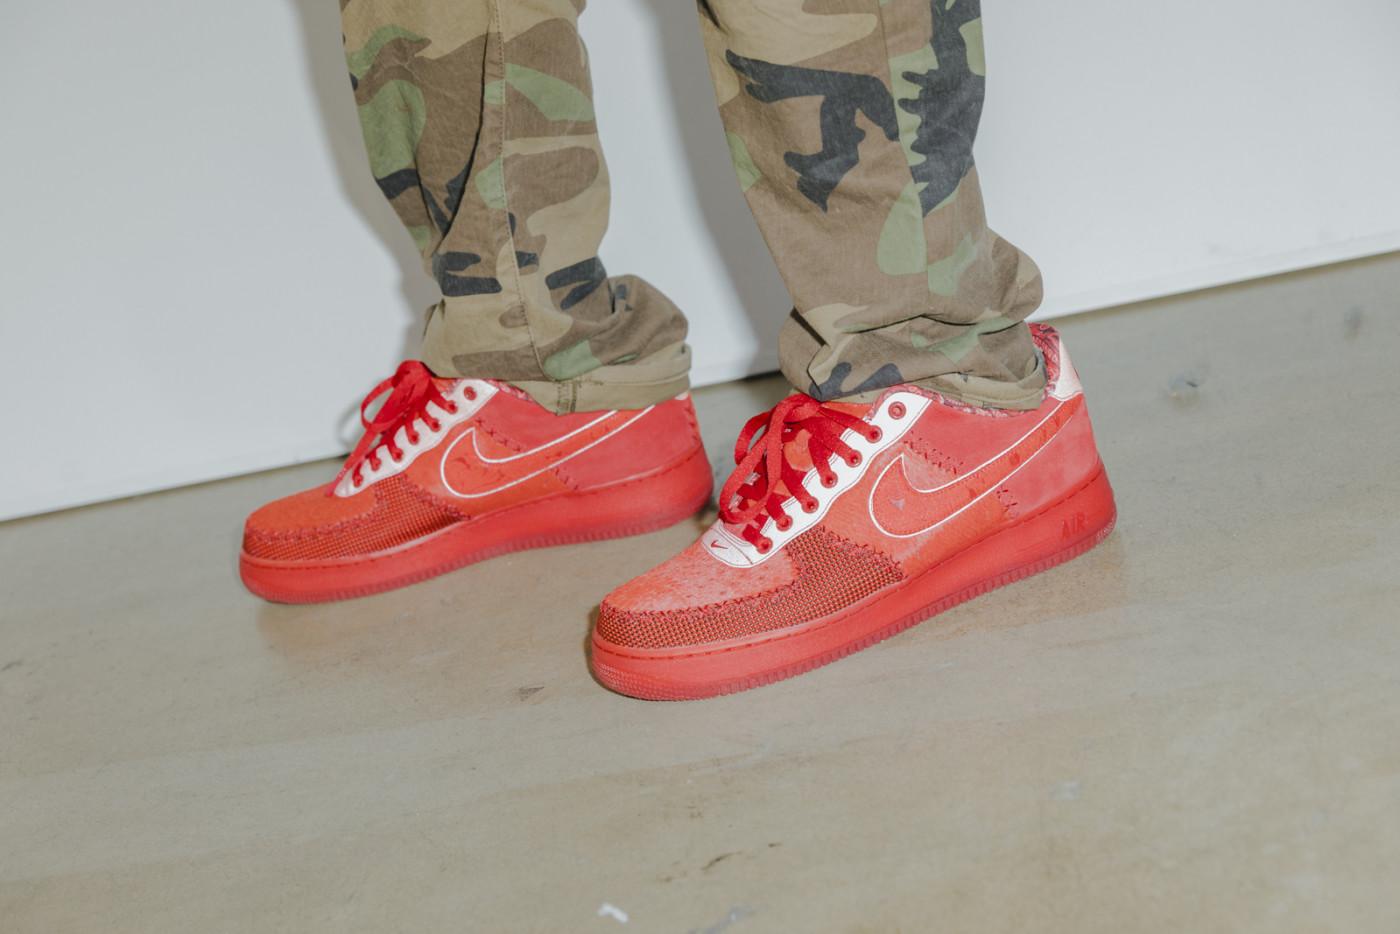 Nike Air Force 1 OBJ